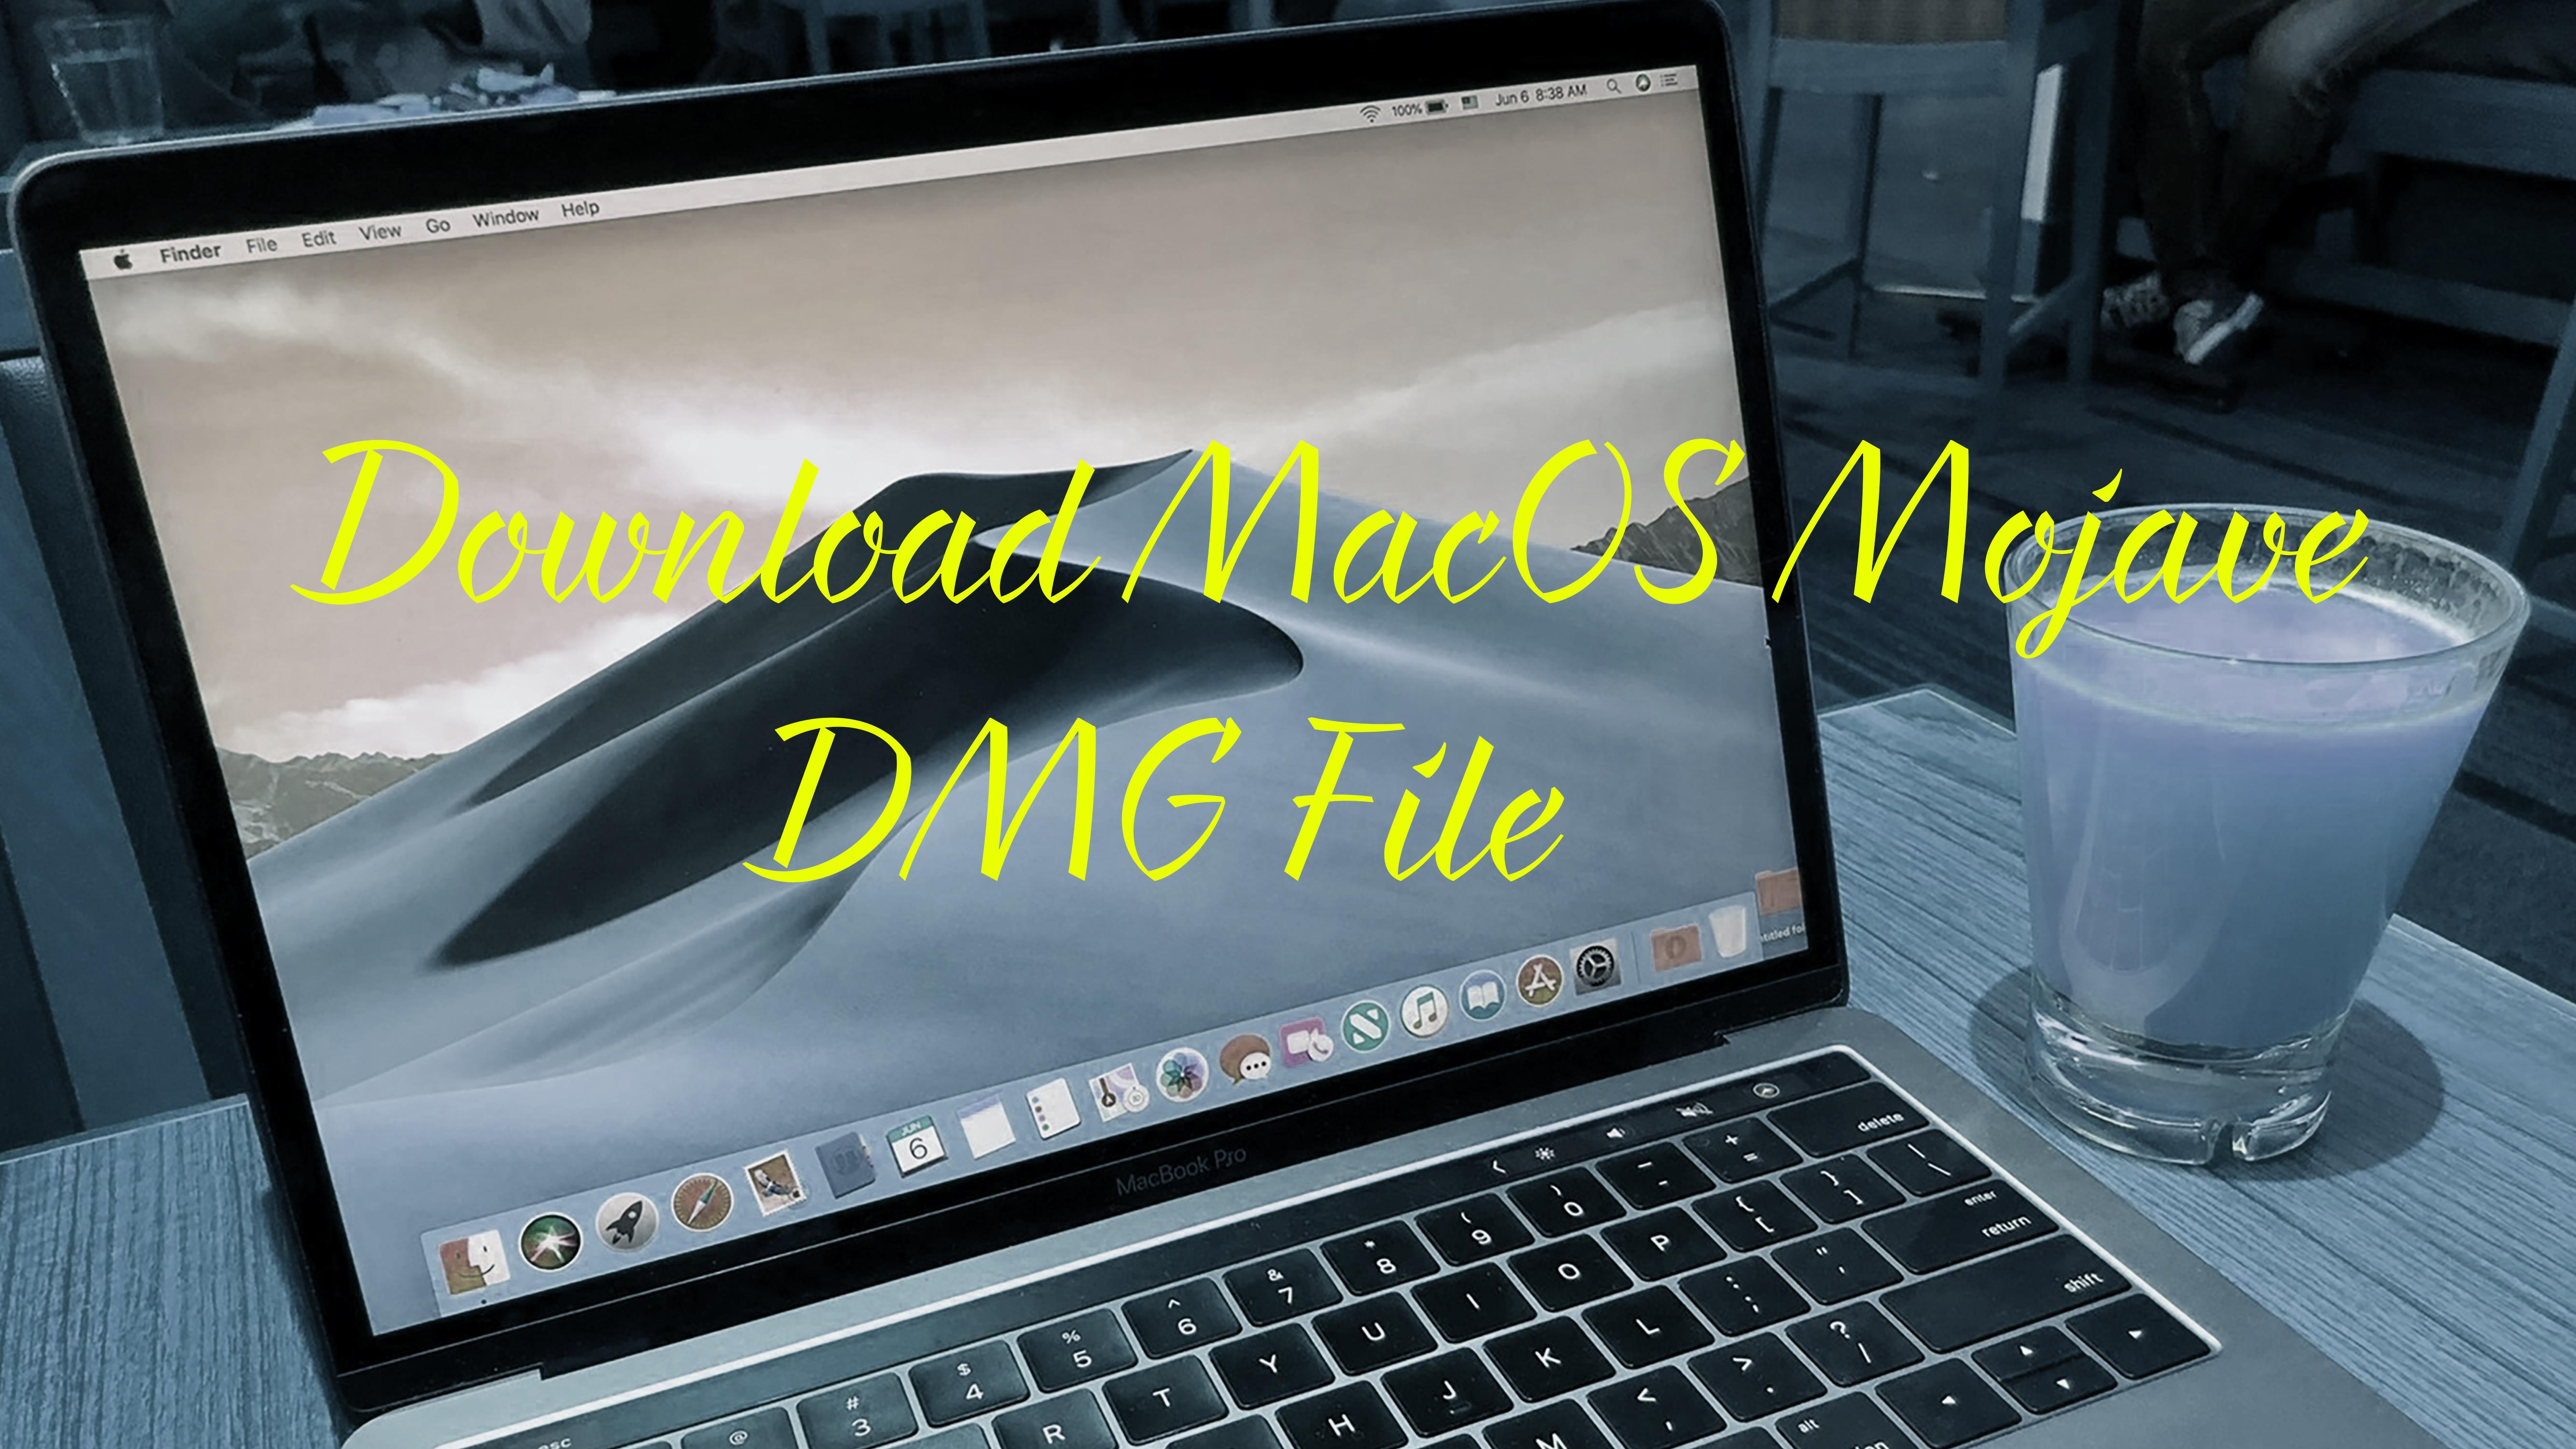 Download macos high sierra full dmg | Peatix